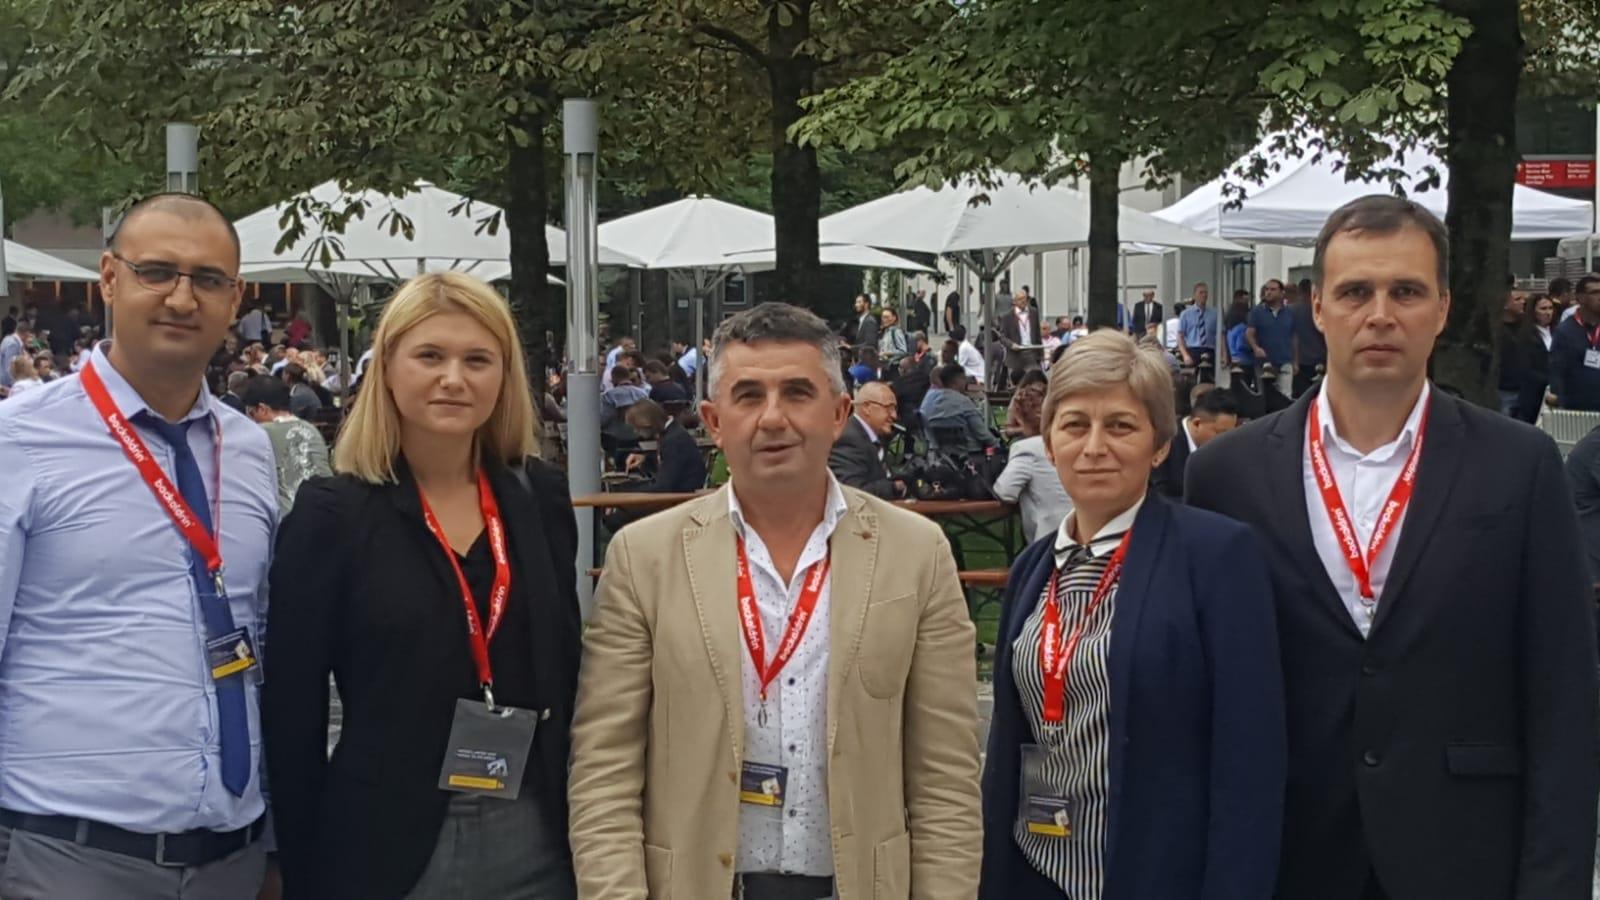 Echipa Steldico la Iba Munchen 2018